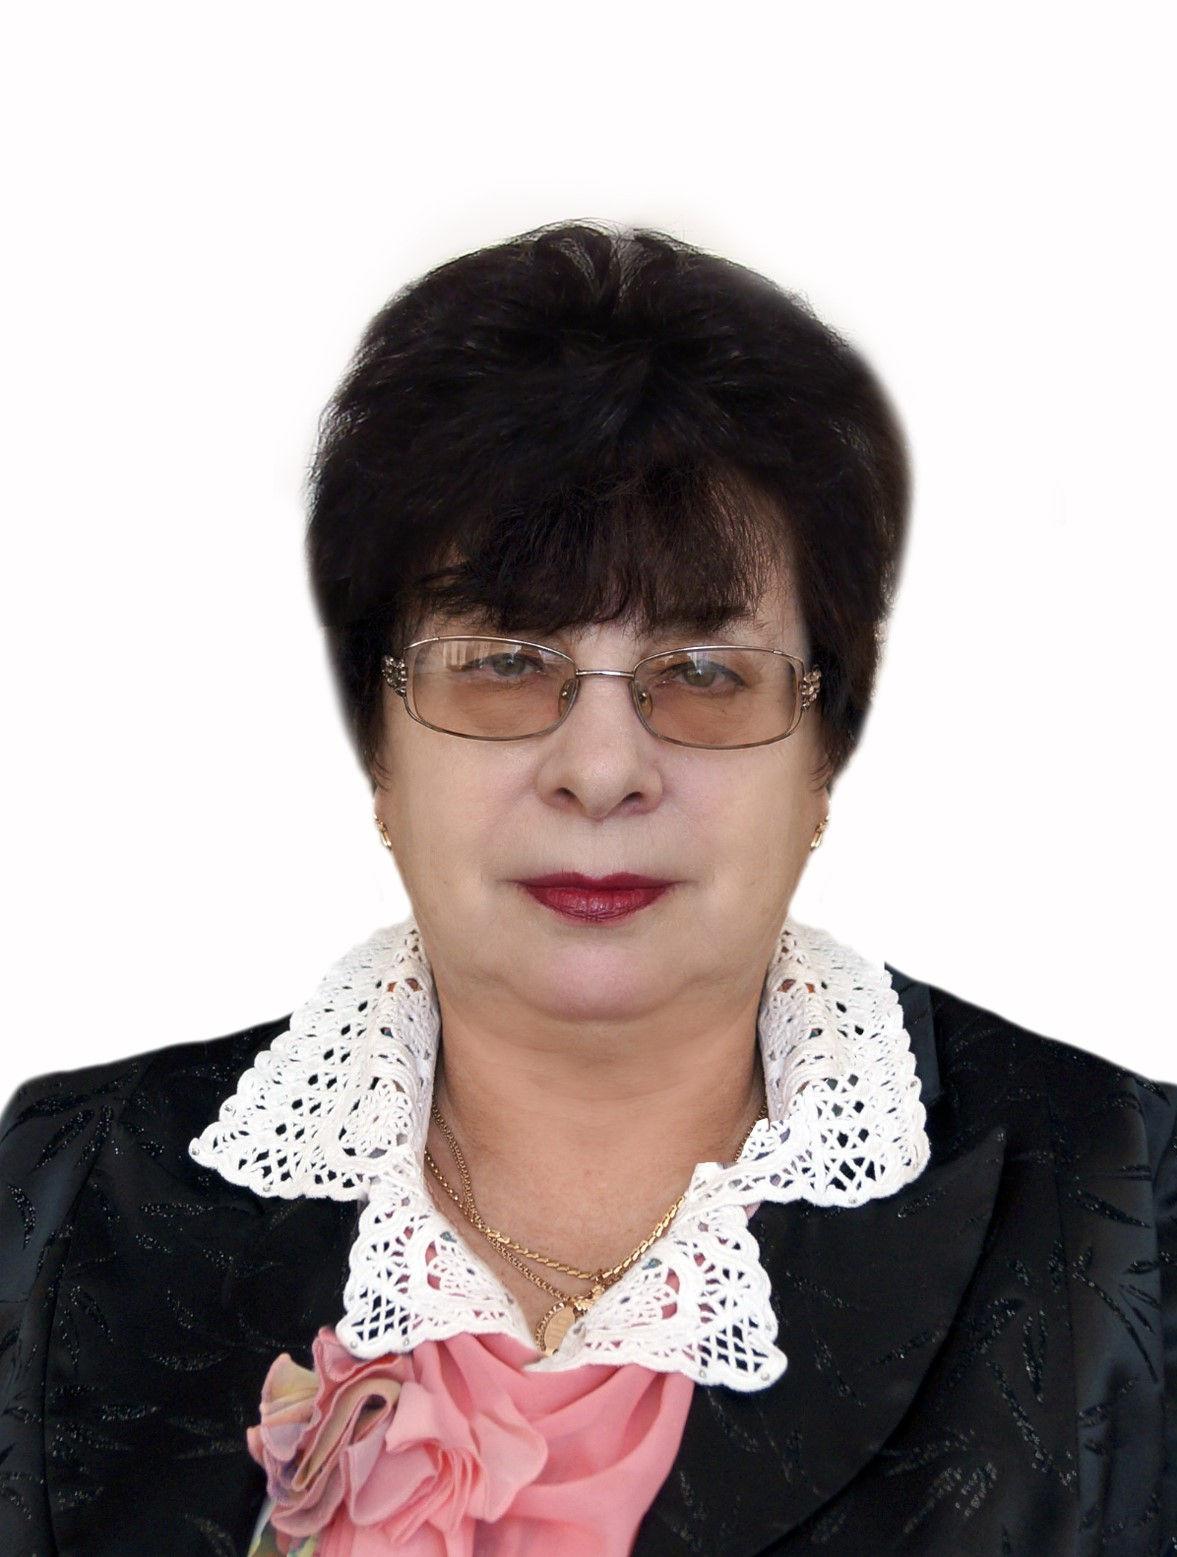 Светлана Николаевна Дудкина, поздравляем с юбилеем!